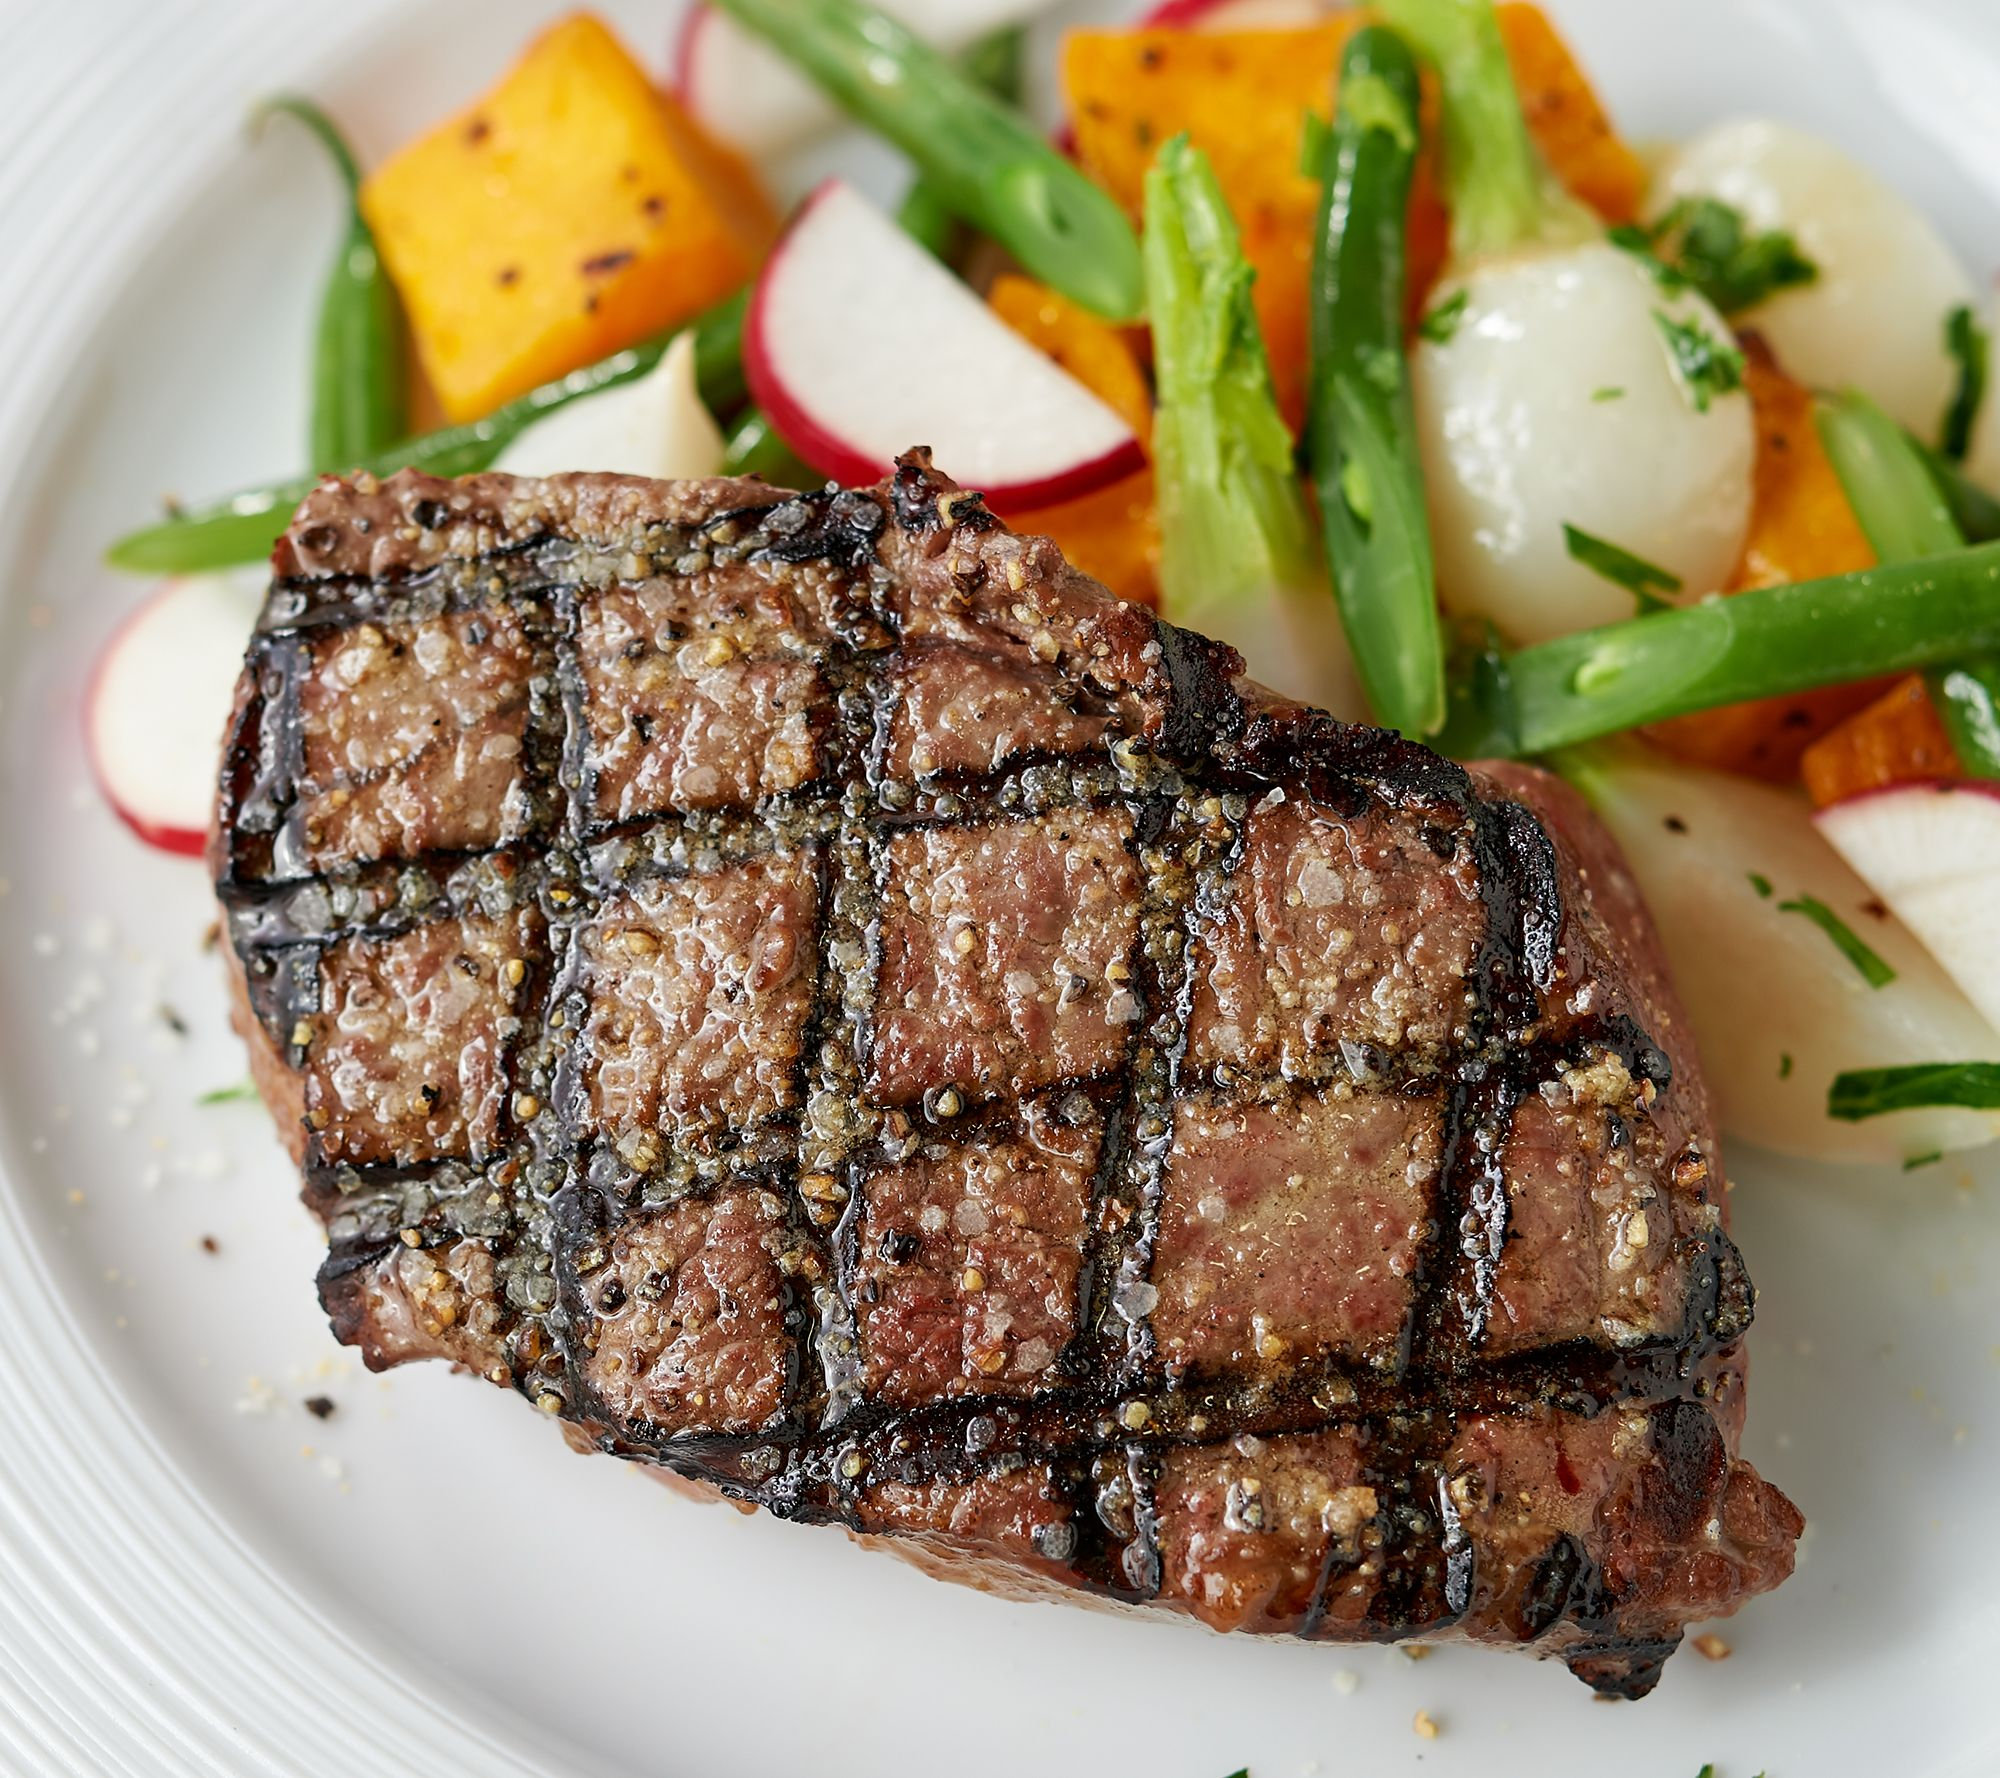 Kansas City Steak (8) 6-oz Top Sirloin Steaks with Seasoning - QVC.com